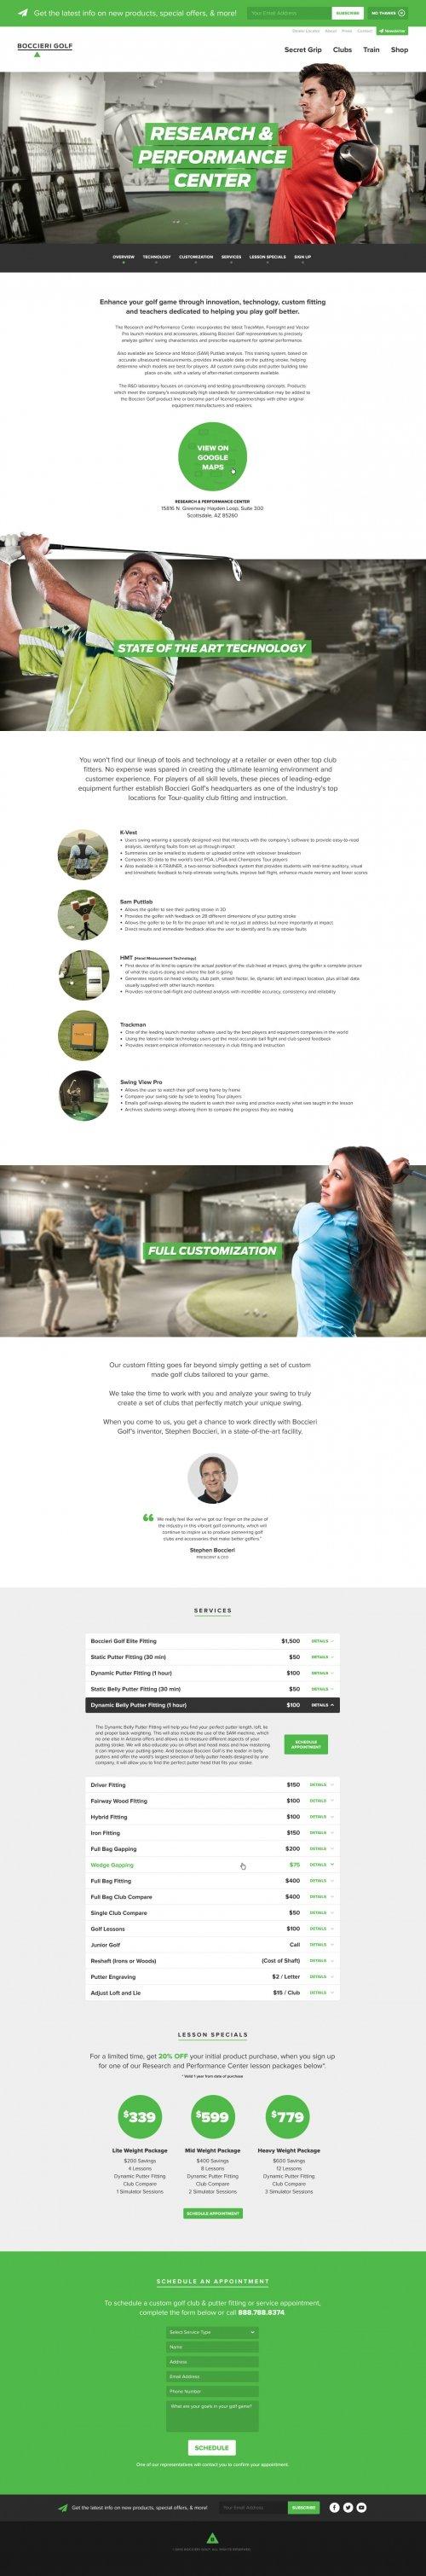 Website - Research & Performance Center